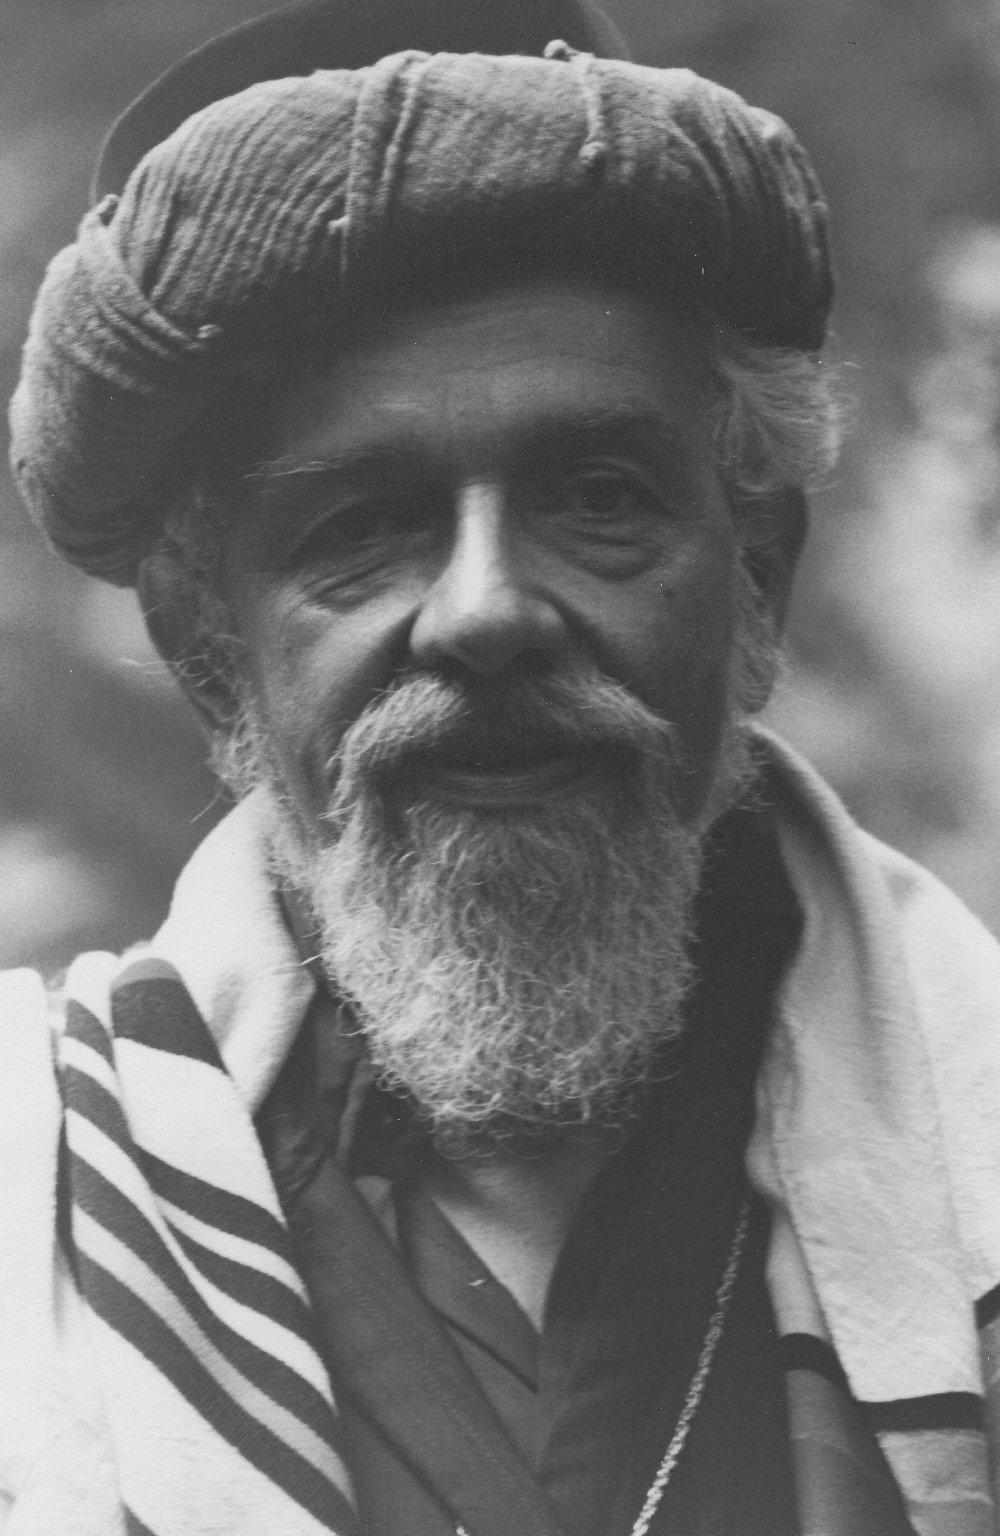 Rabbi Zalman Schachter-Shalomi in sheikh's turban, robe, and tallit, ca. 1980s.